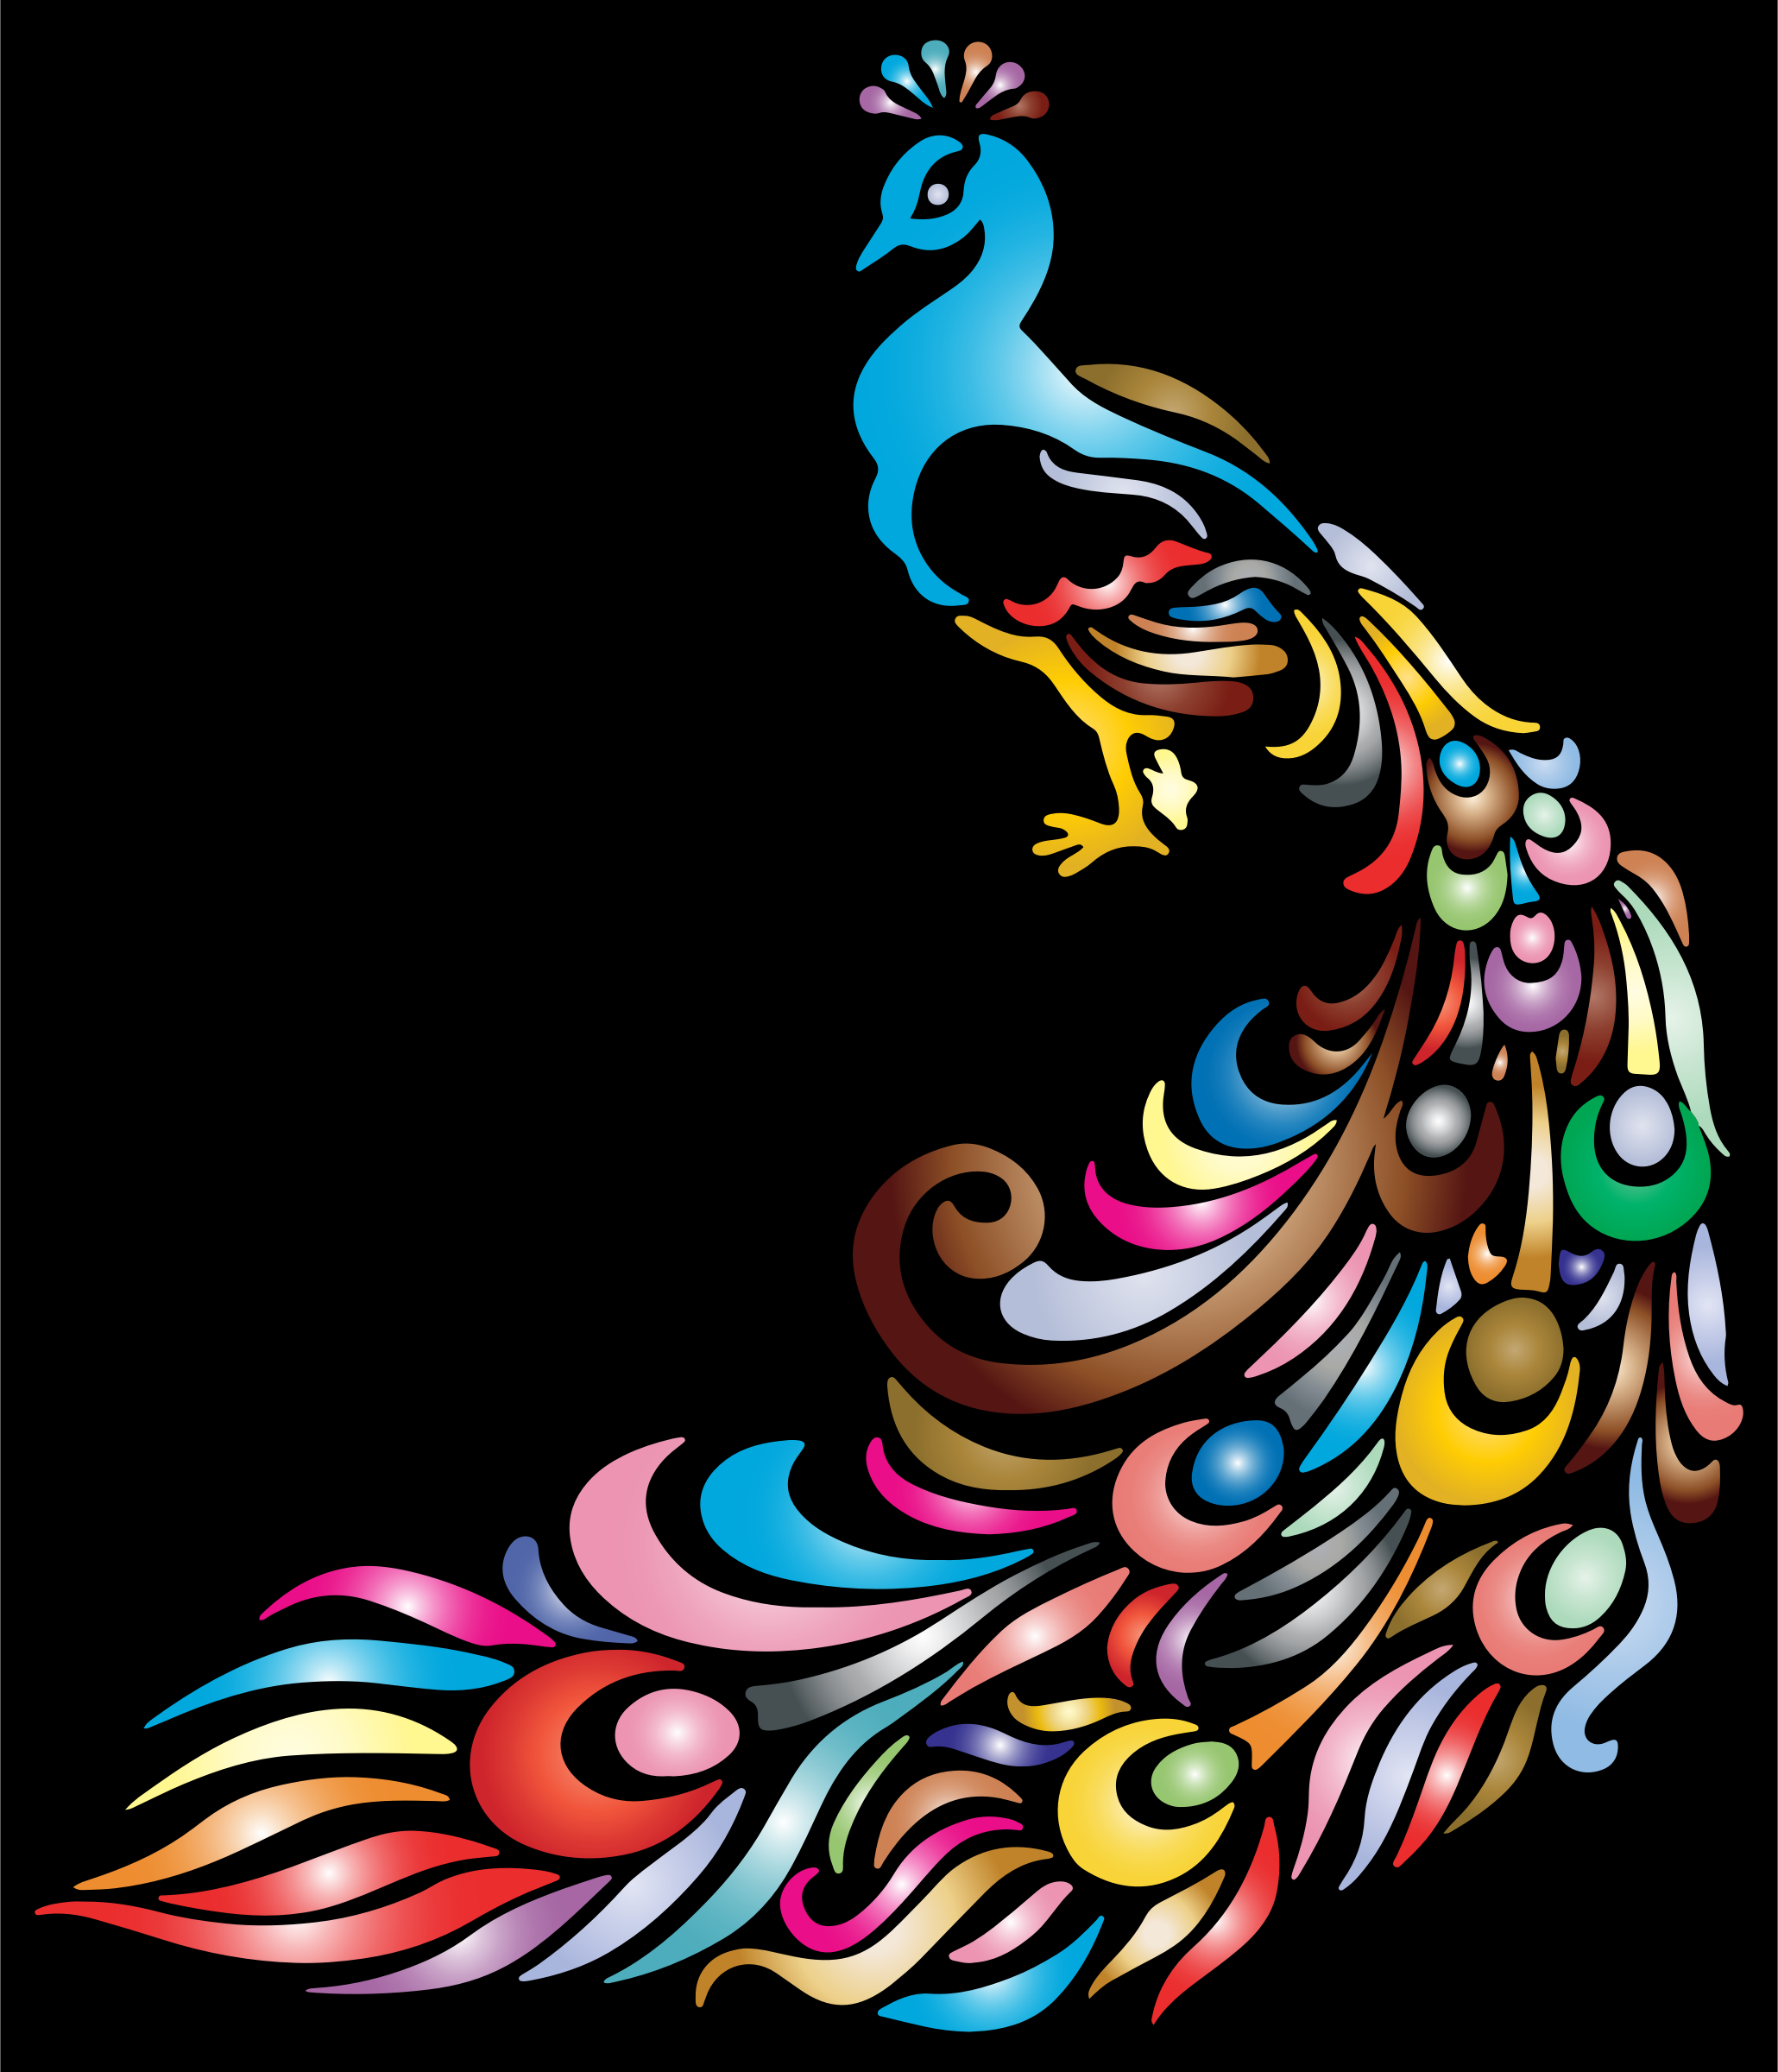 Peacock clipart big Peacock BIG 2 Clipart IMAGE